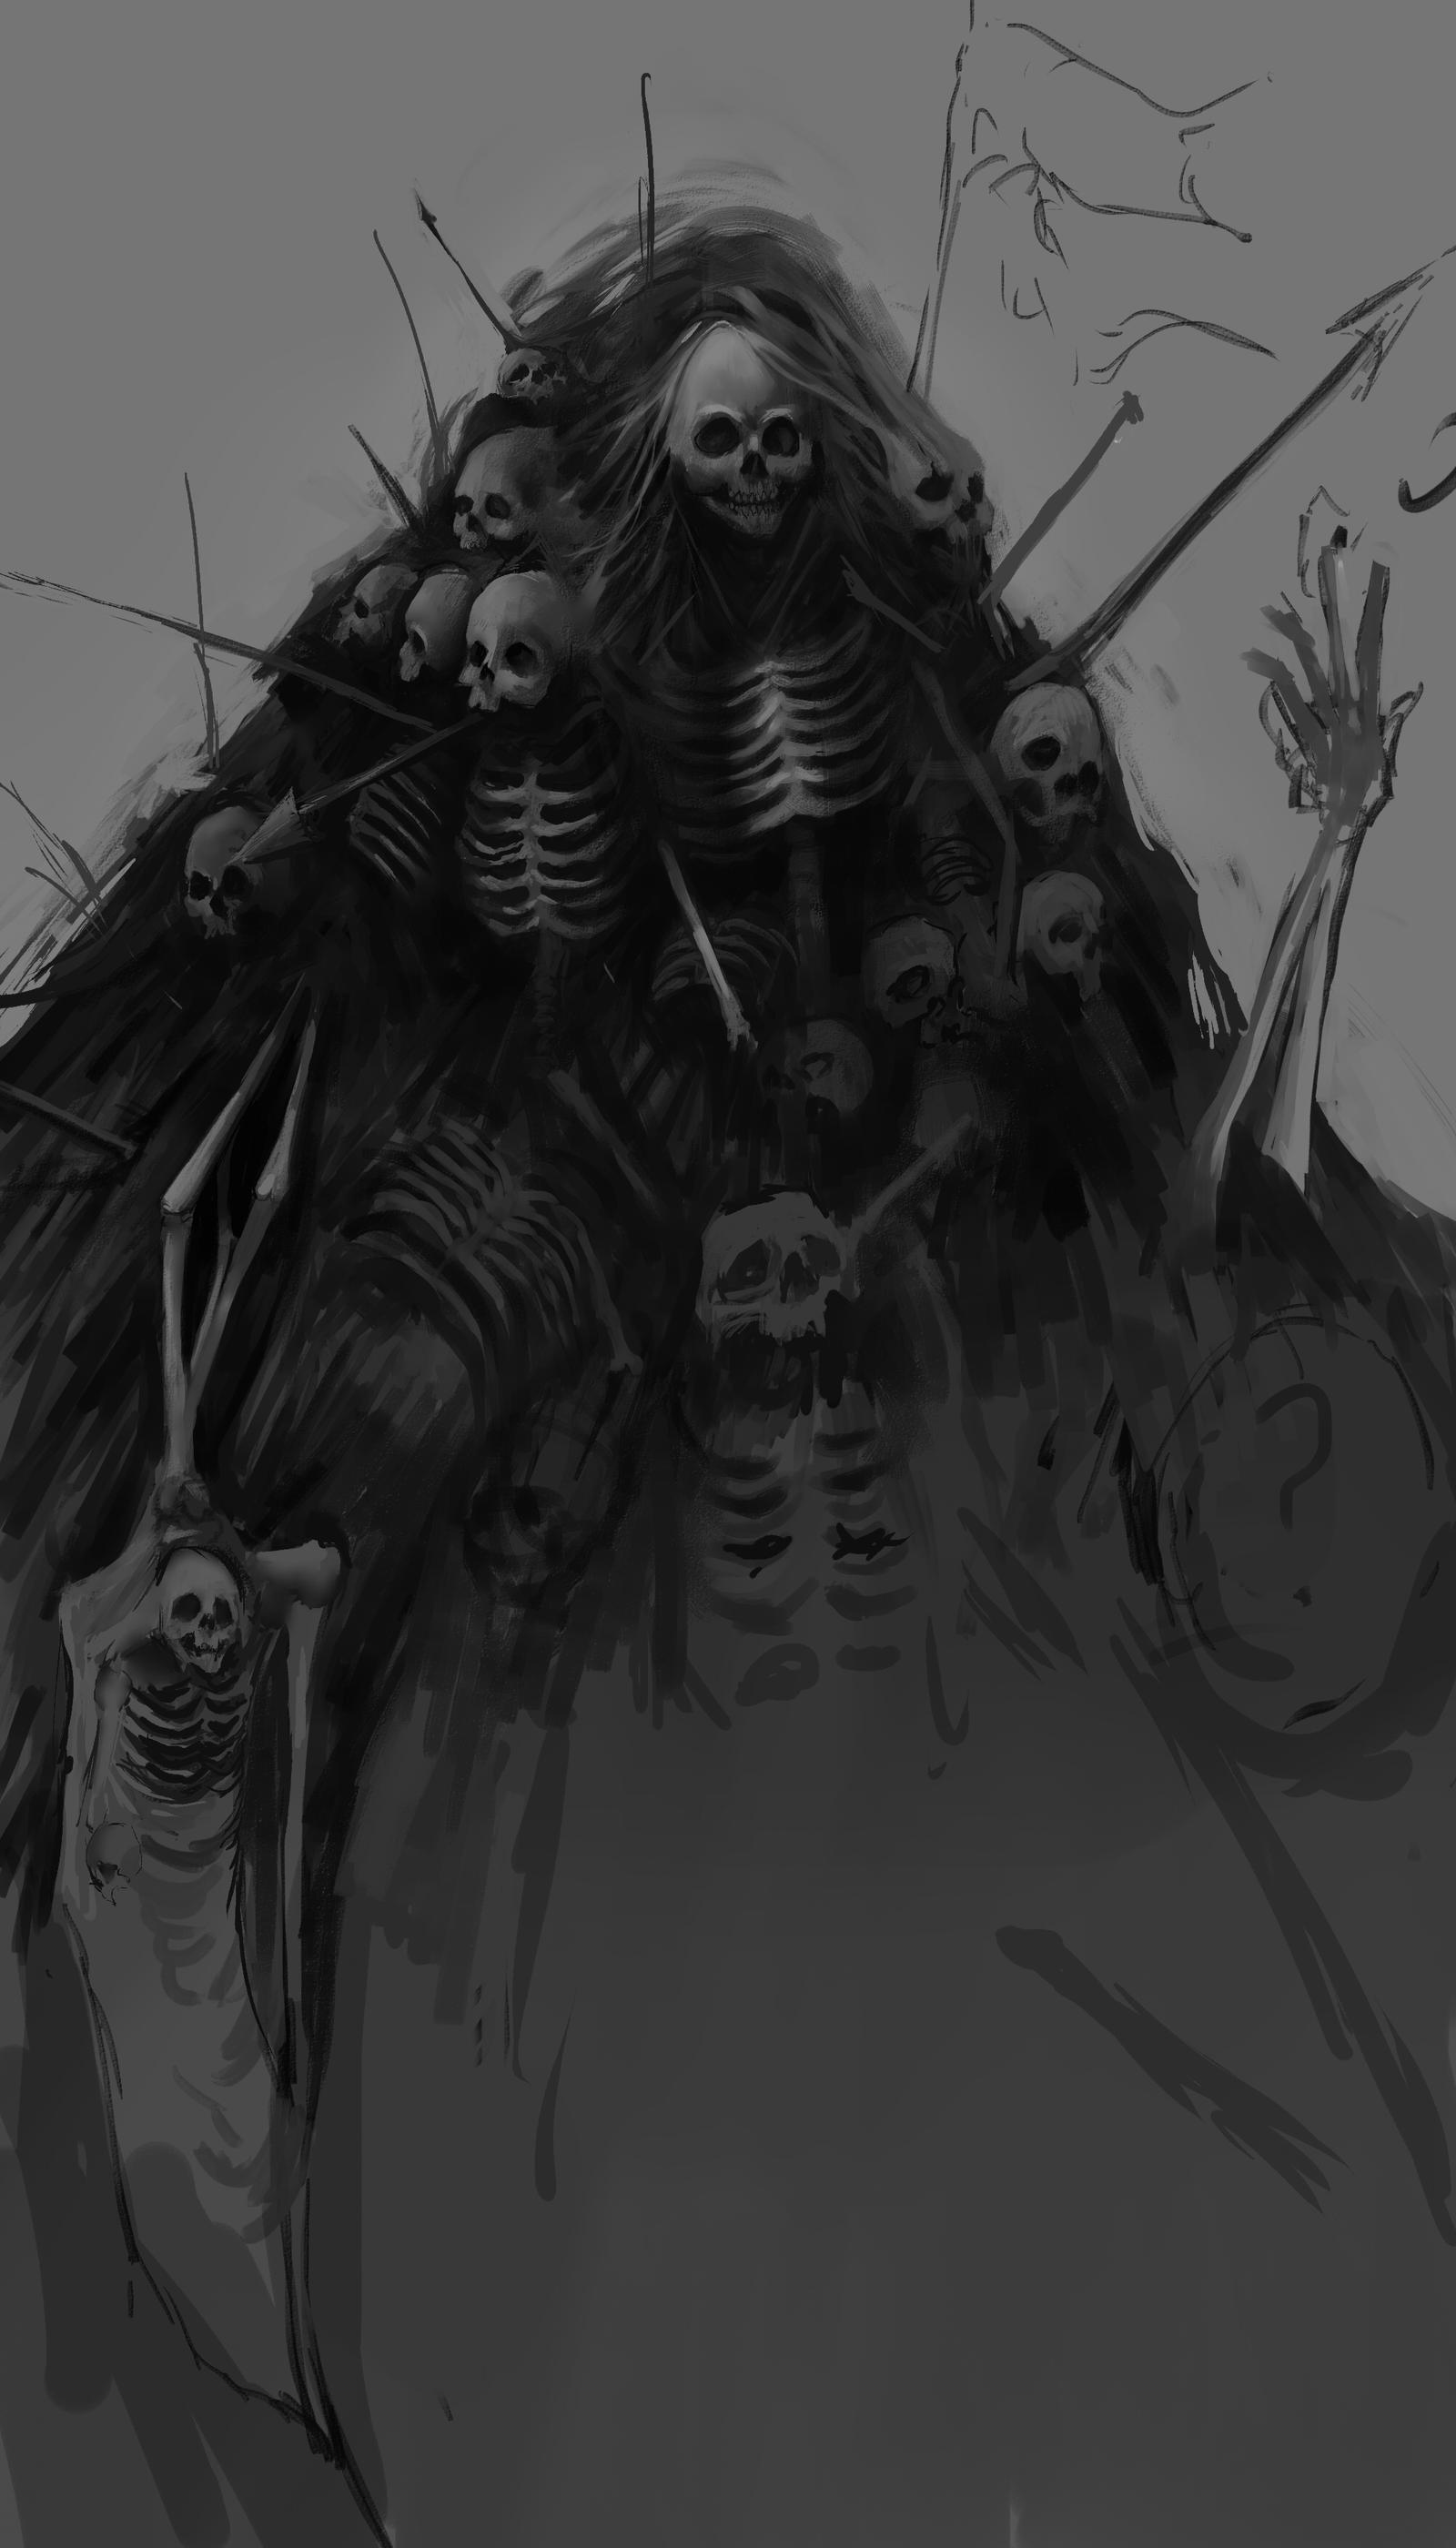 dark souls nito artwork - photo #11